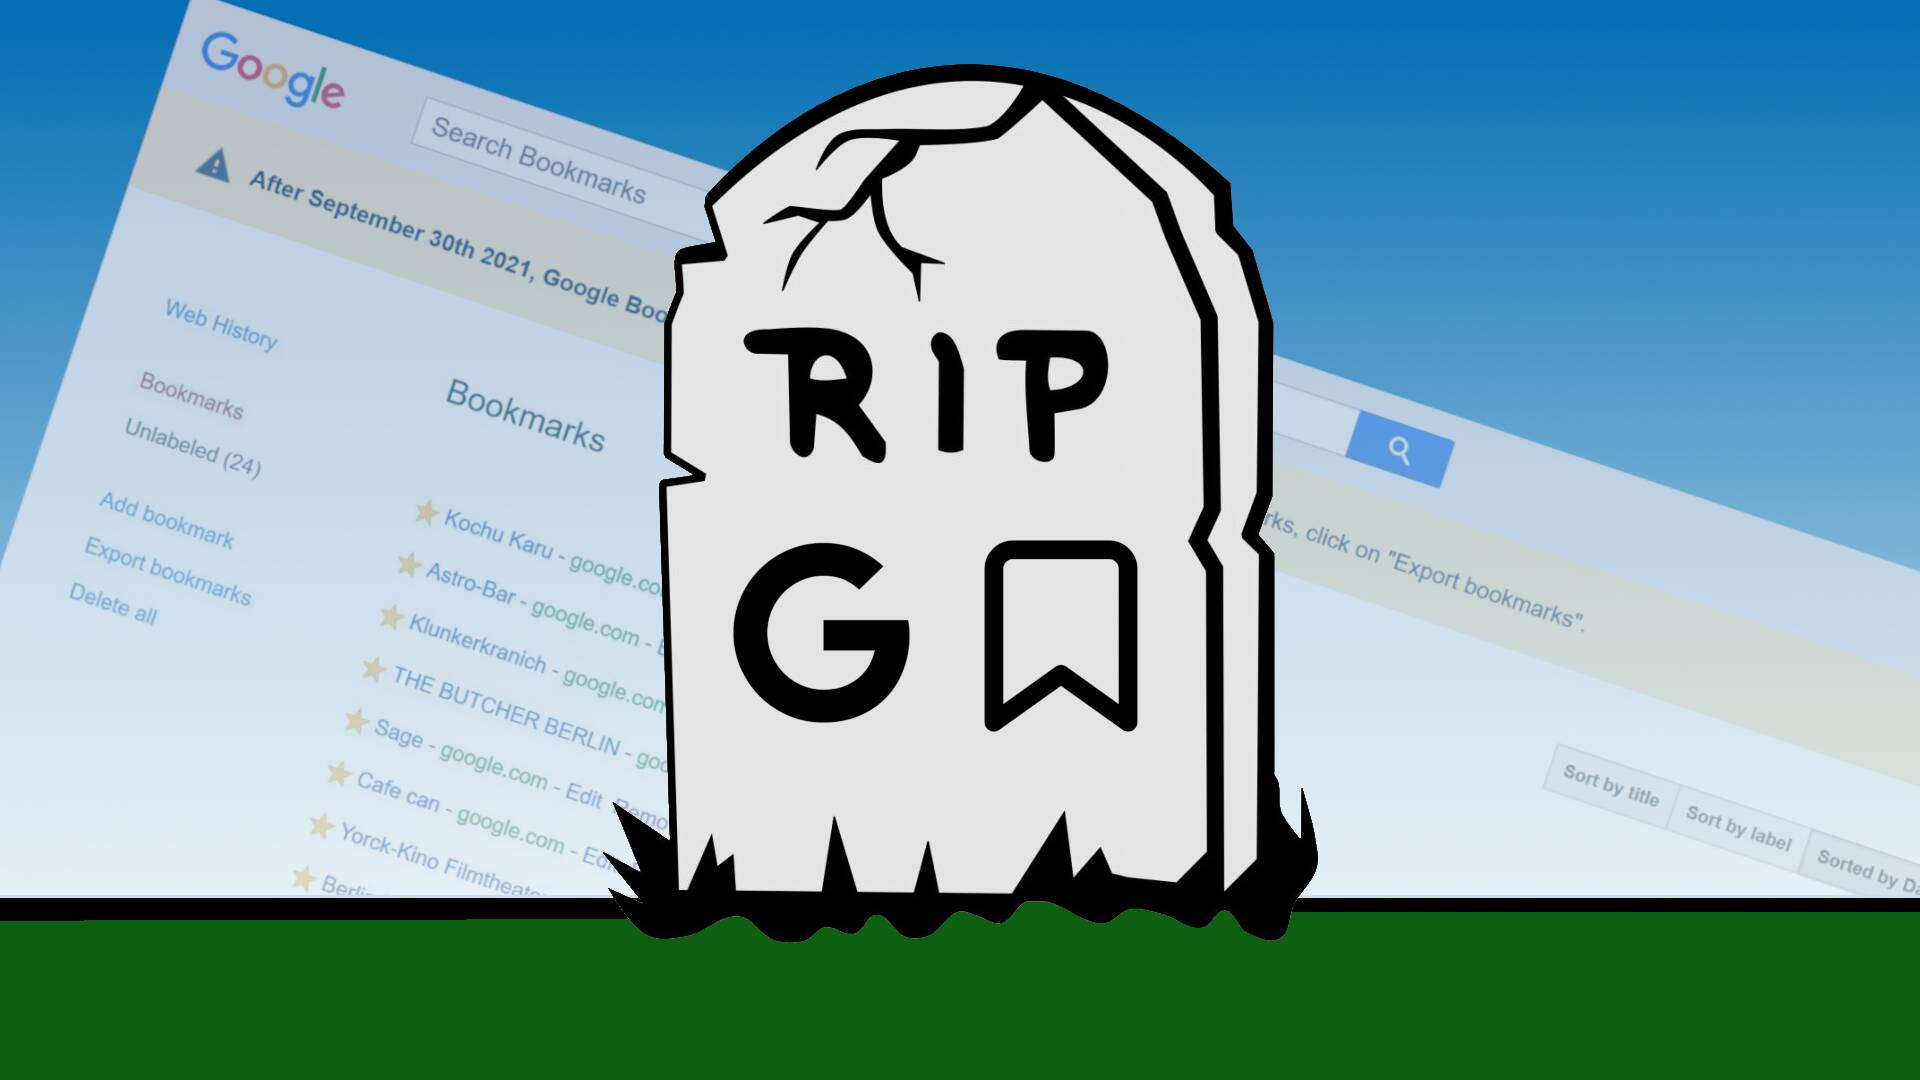 Google Bookmarks RIP